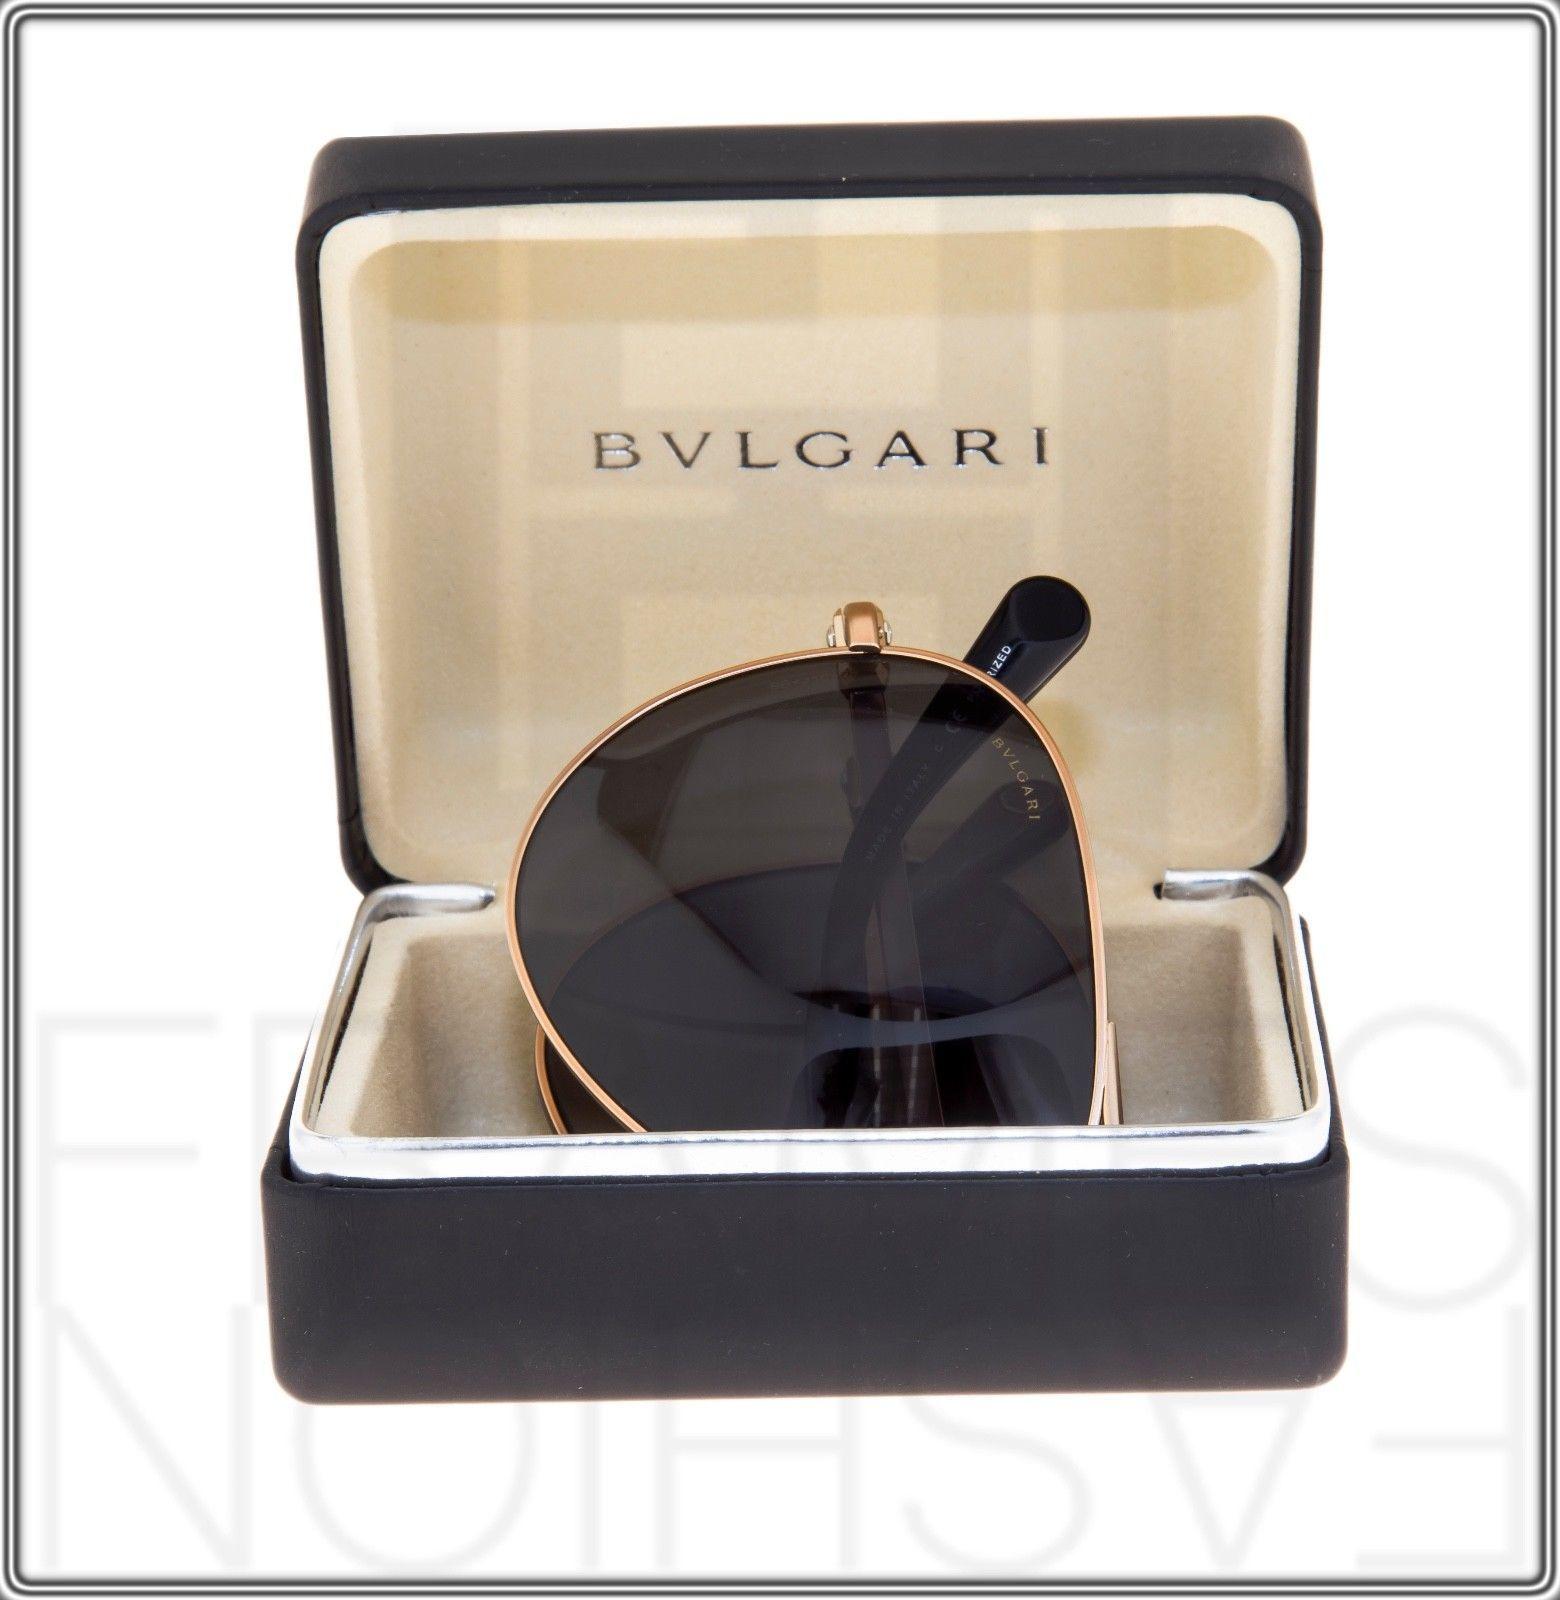 BVLGARI Le Gemme Black Rose Gold 18K Plated POLARIZED Foldable Sunglasses 5034 image 7